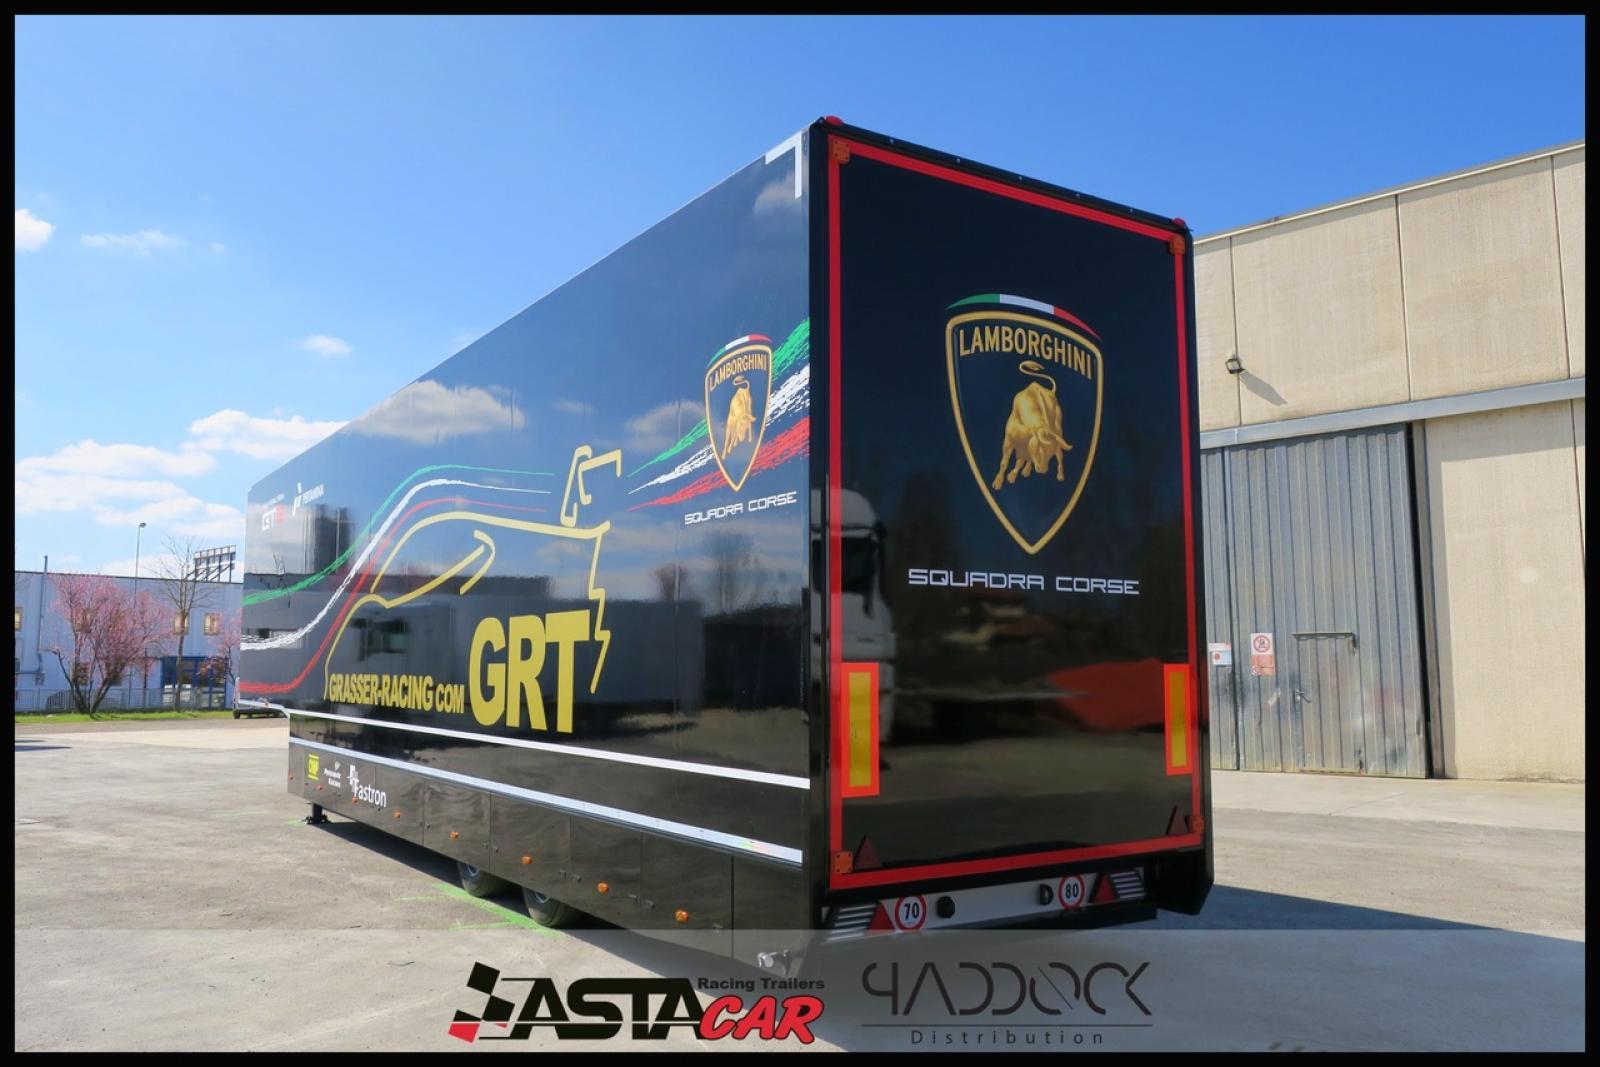 USED TRAILER ASTA CAR Y2 BY PADDOCK DISTRIBUTION - 3